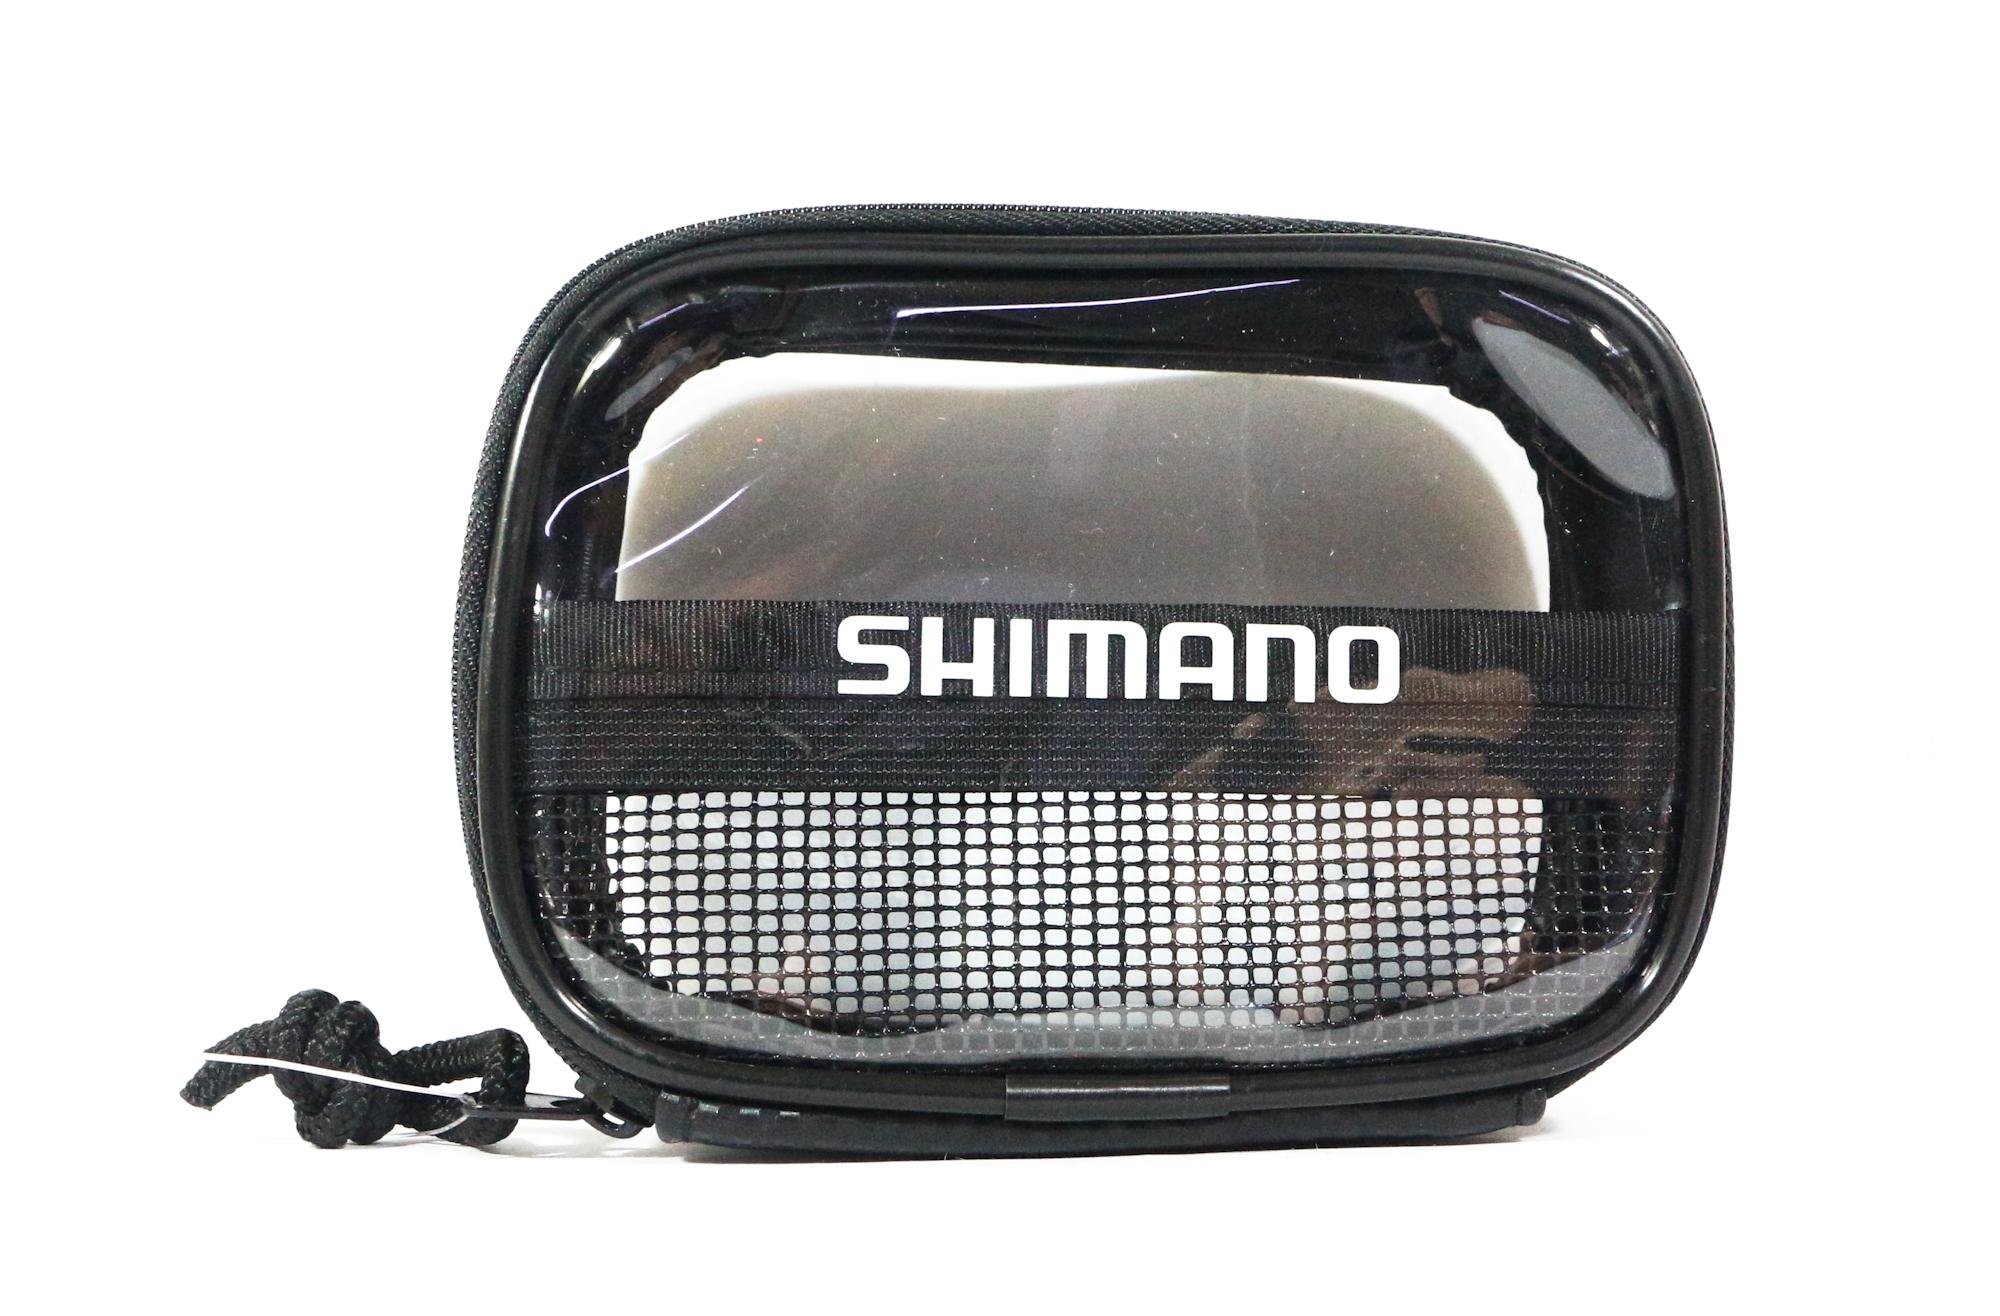 Shimano PC-023I Case Pouch 9 x 125 x 5cm Single Zip Black 718136